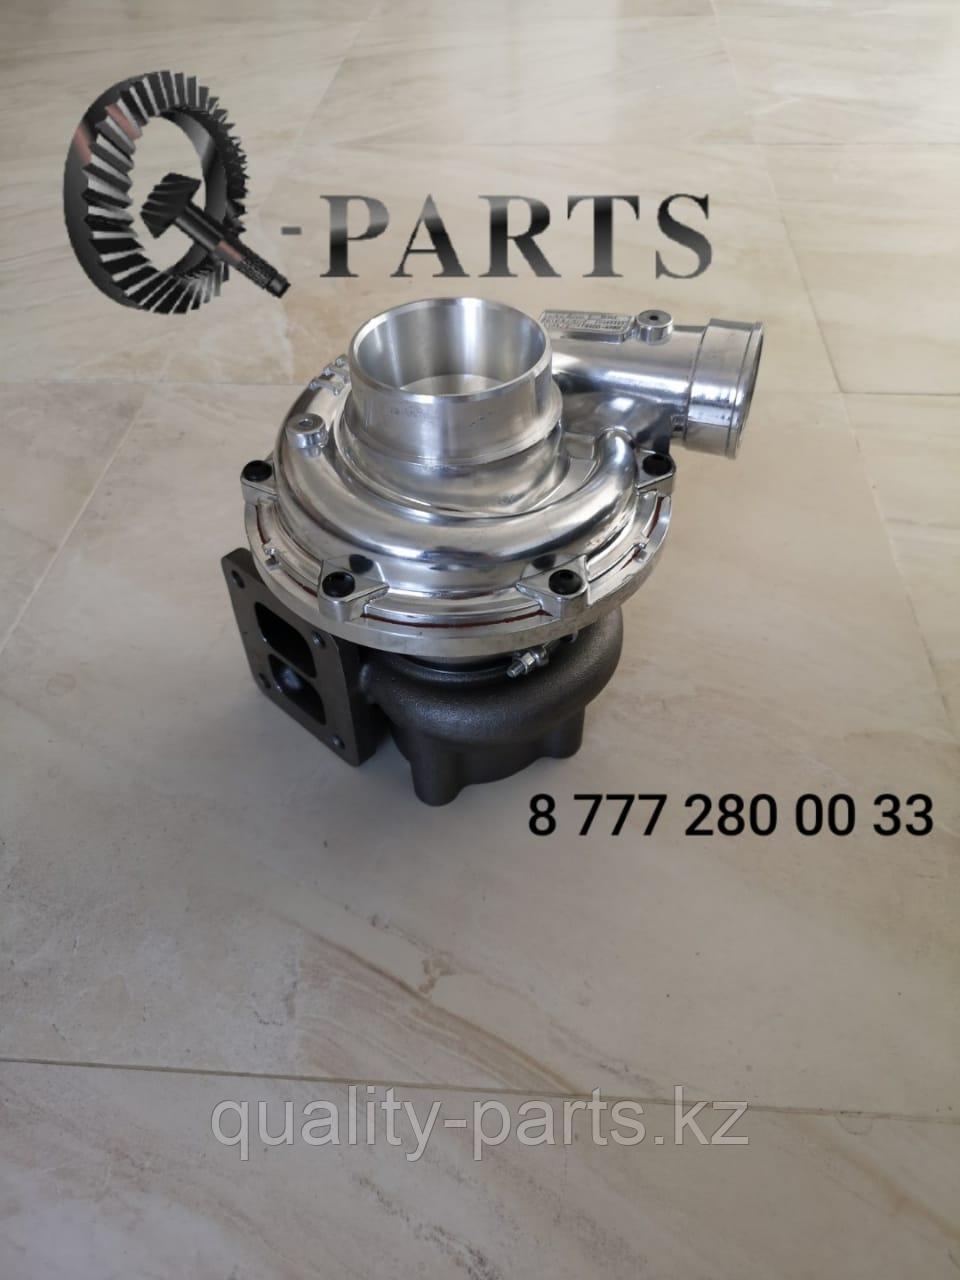 Турбина 1144004180 Isuzu 6HK1 на Hitachi ZX330